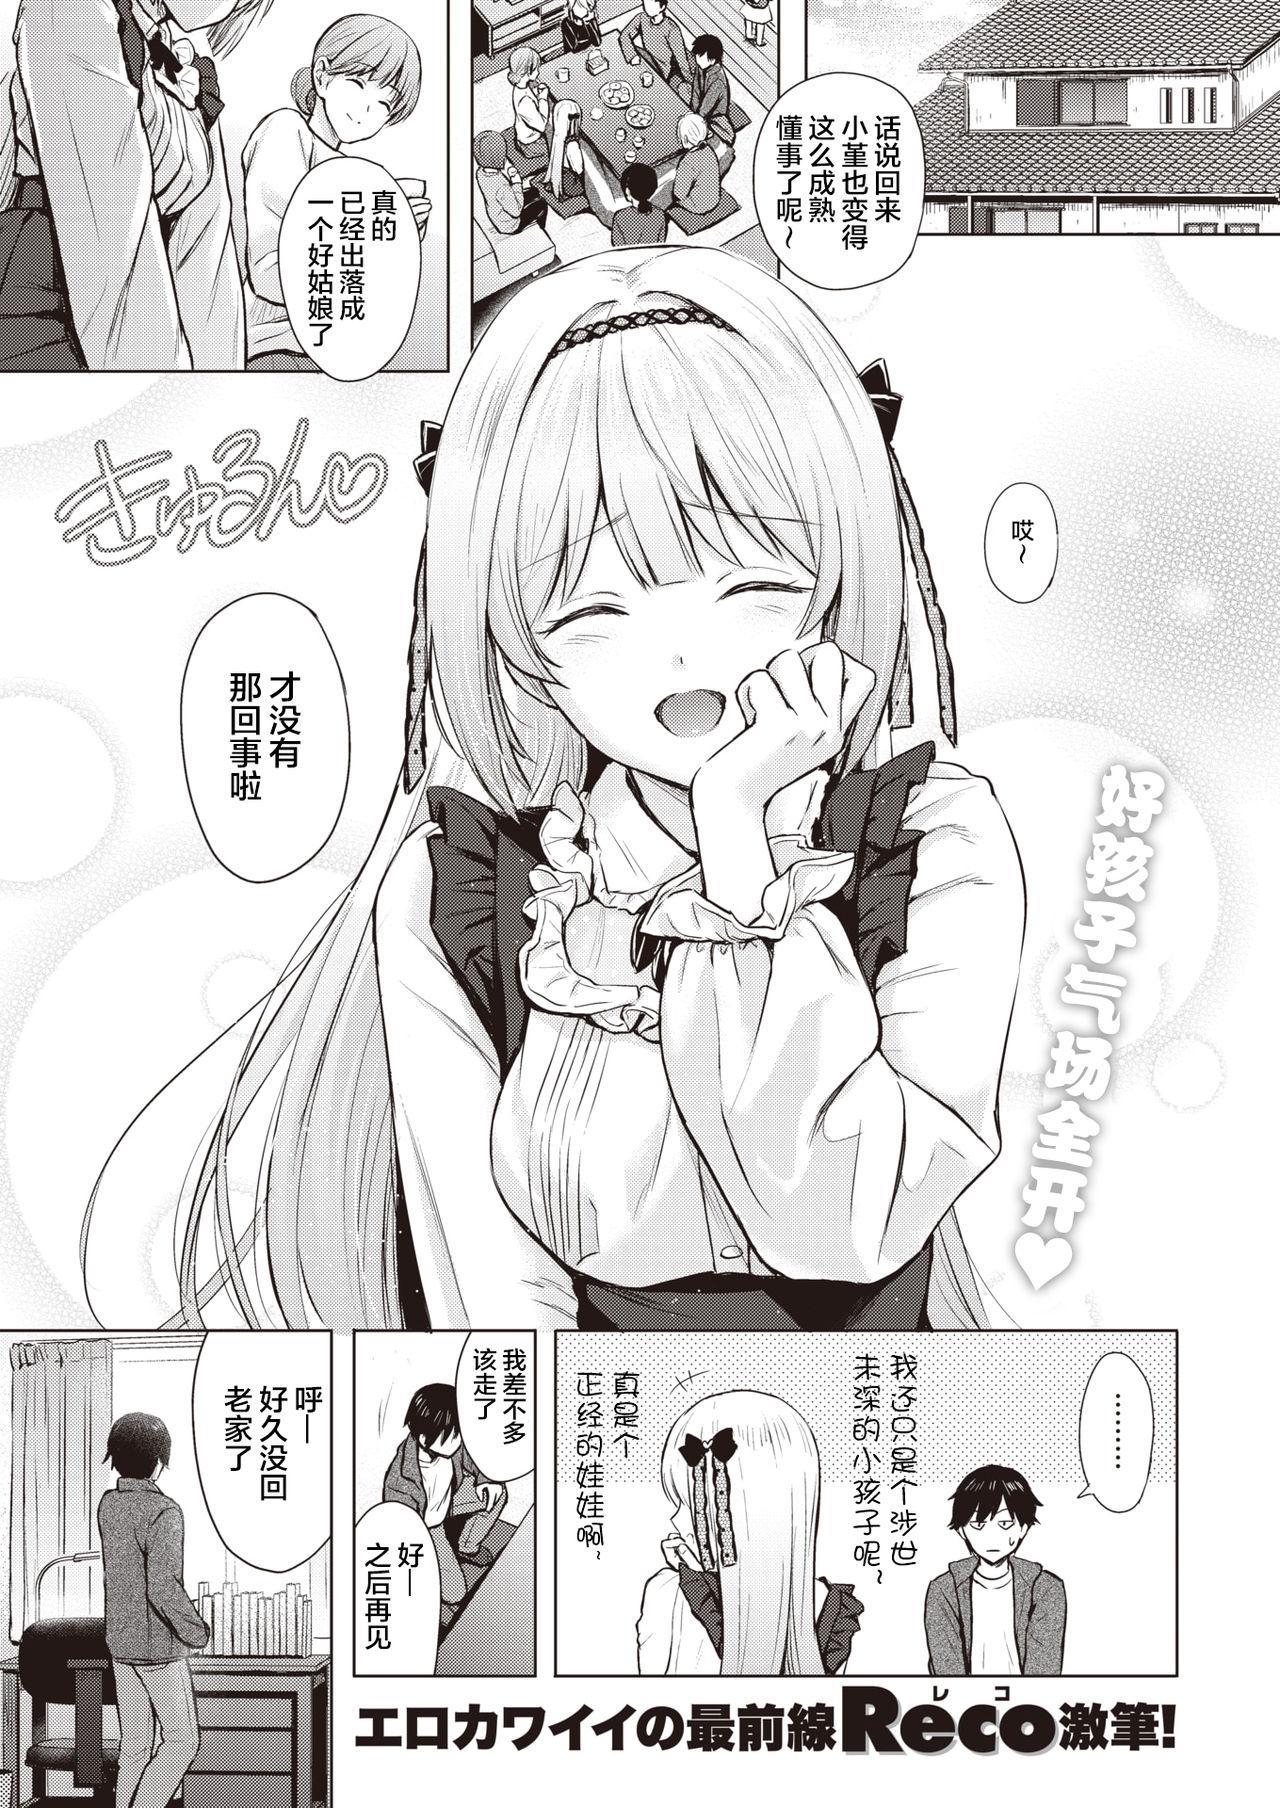 Shiroi Sumire 1